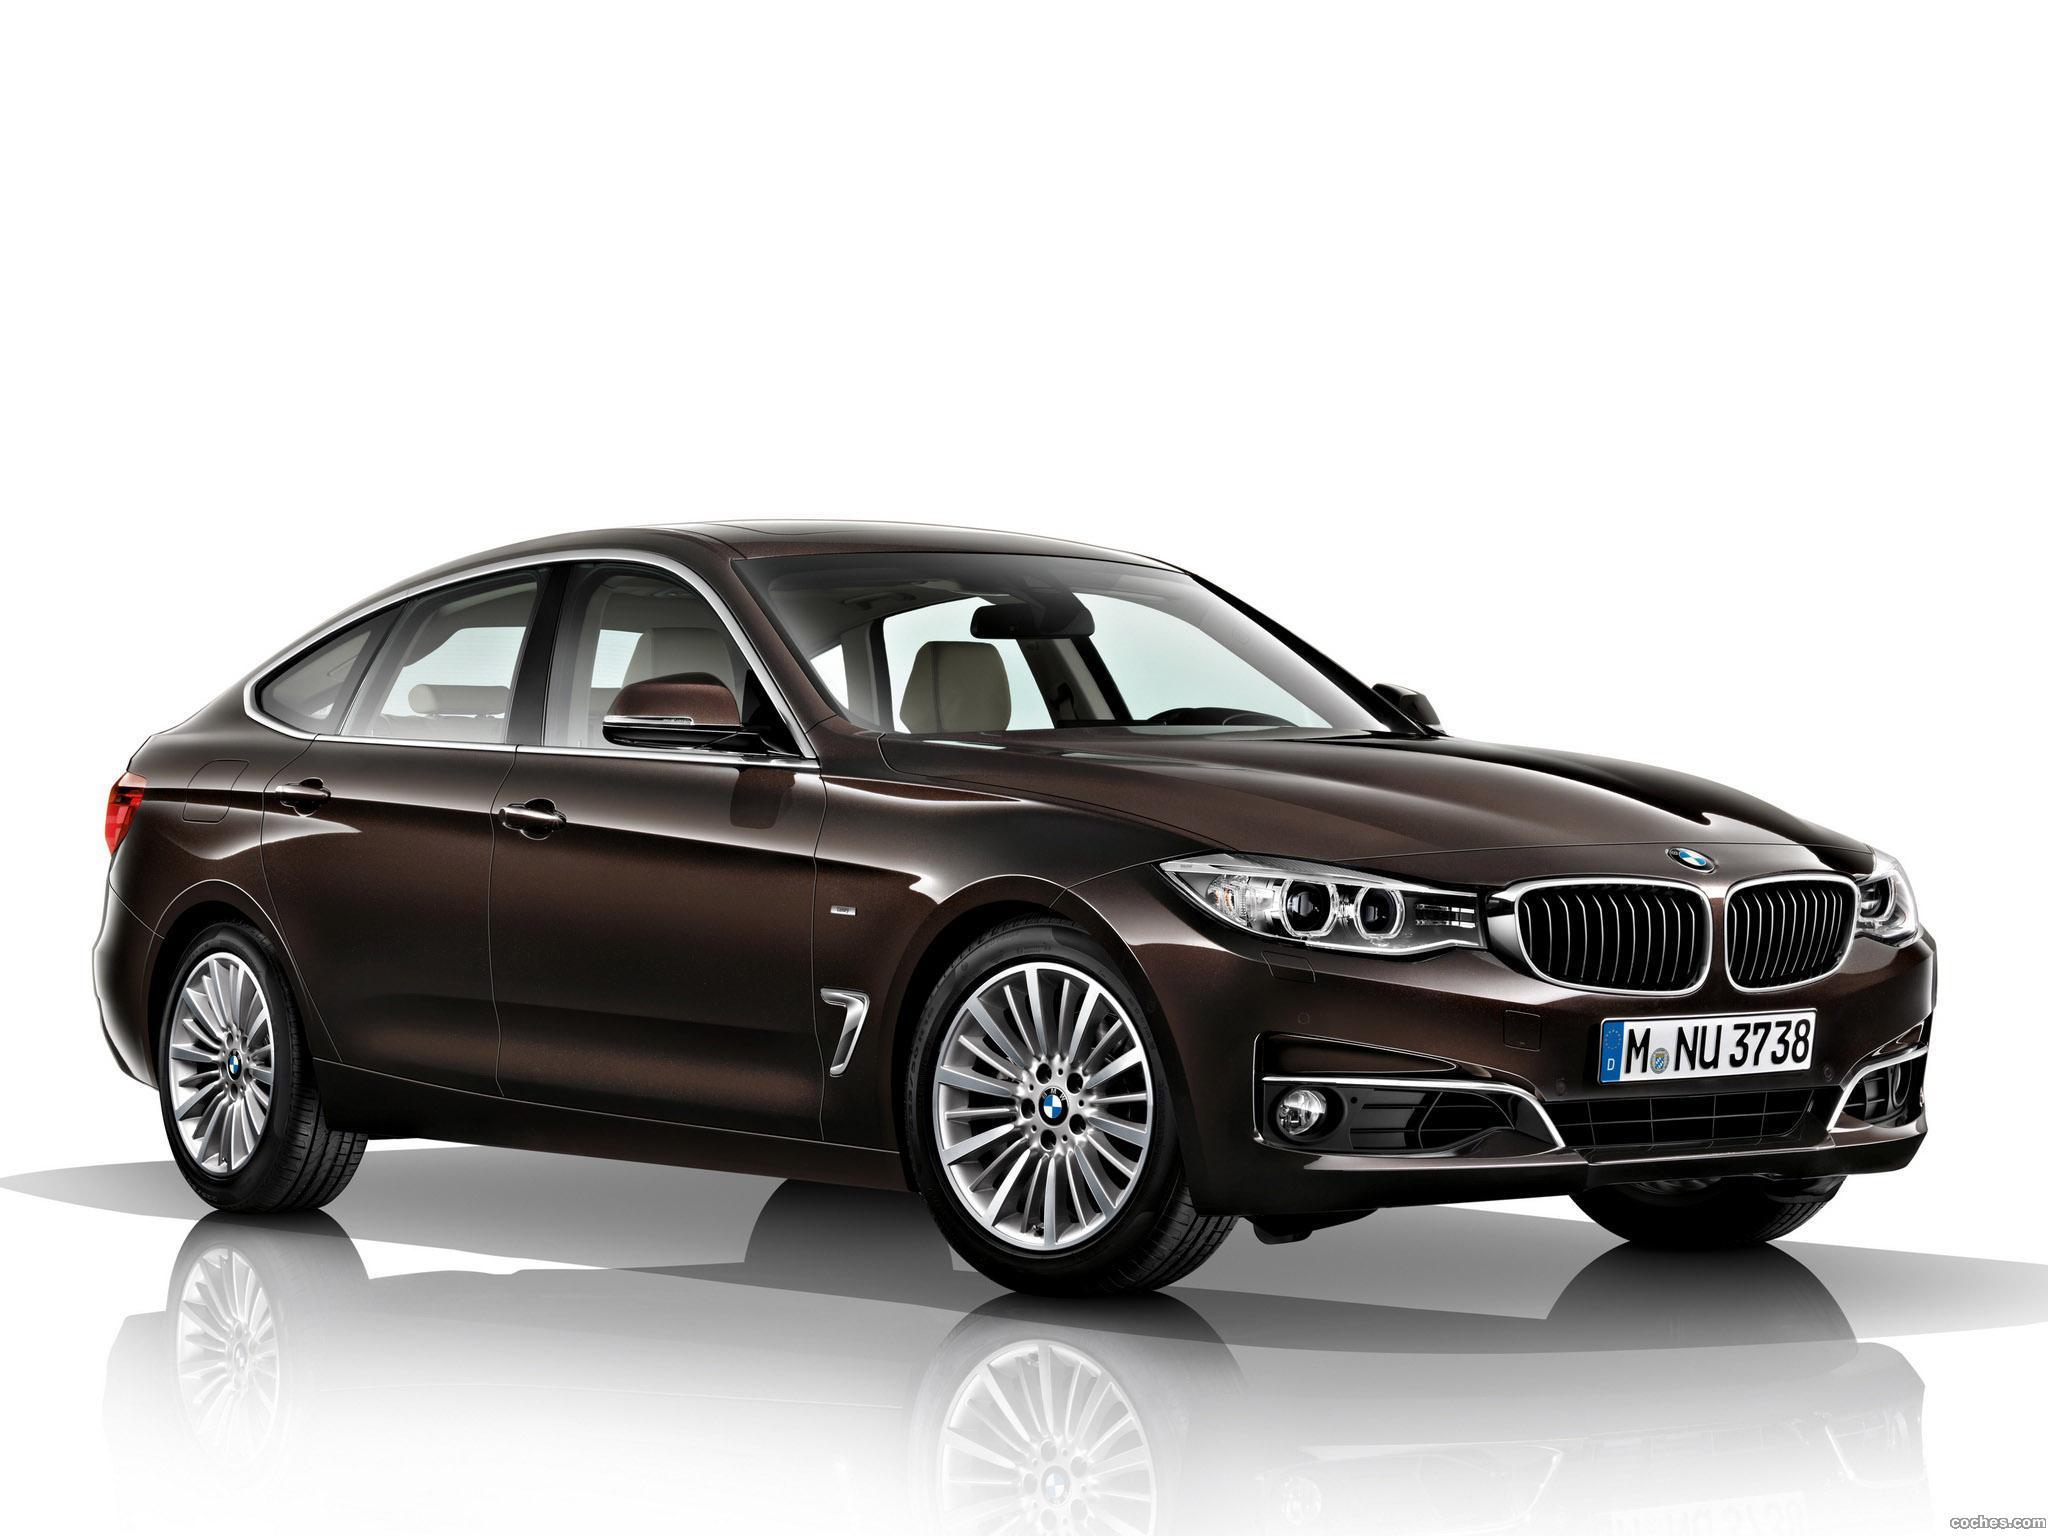 Foto 0 de BMW Serie 3 328i Gran Turismo Luxury Line F34 2013